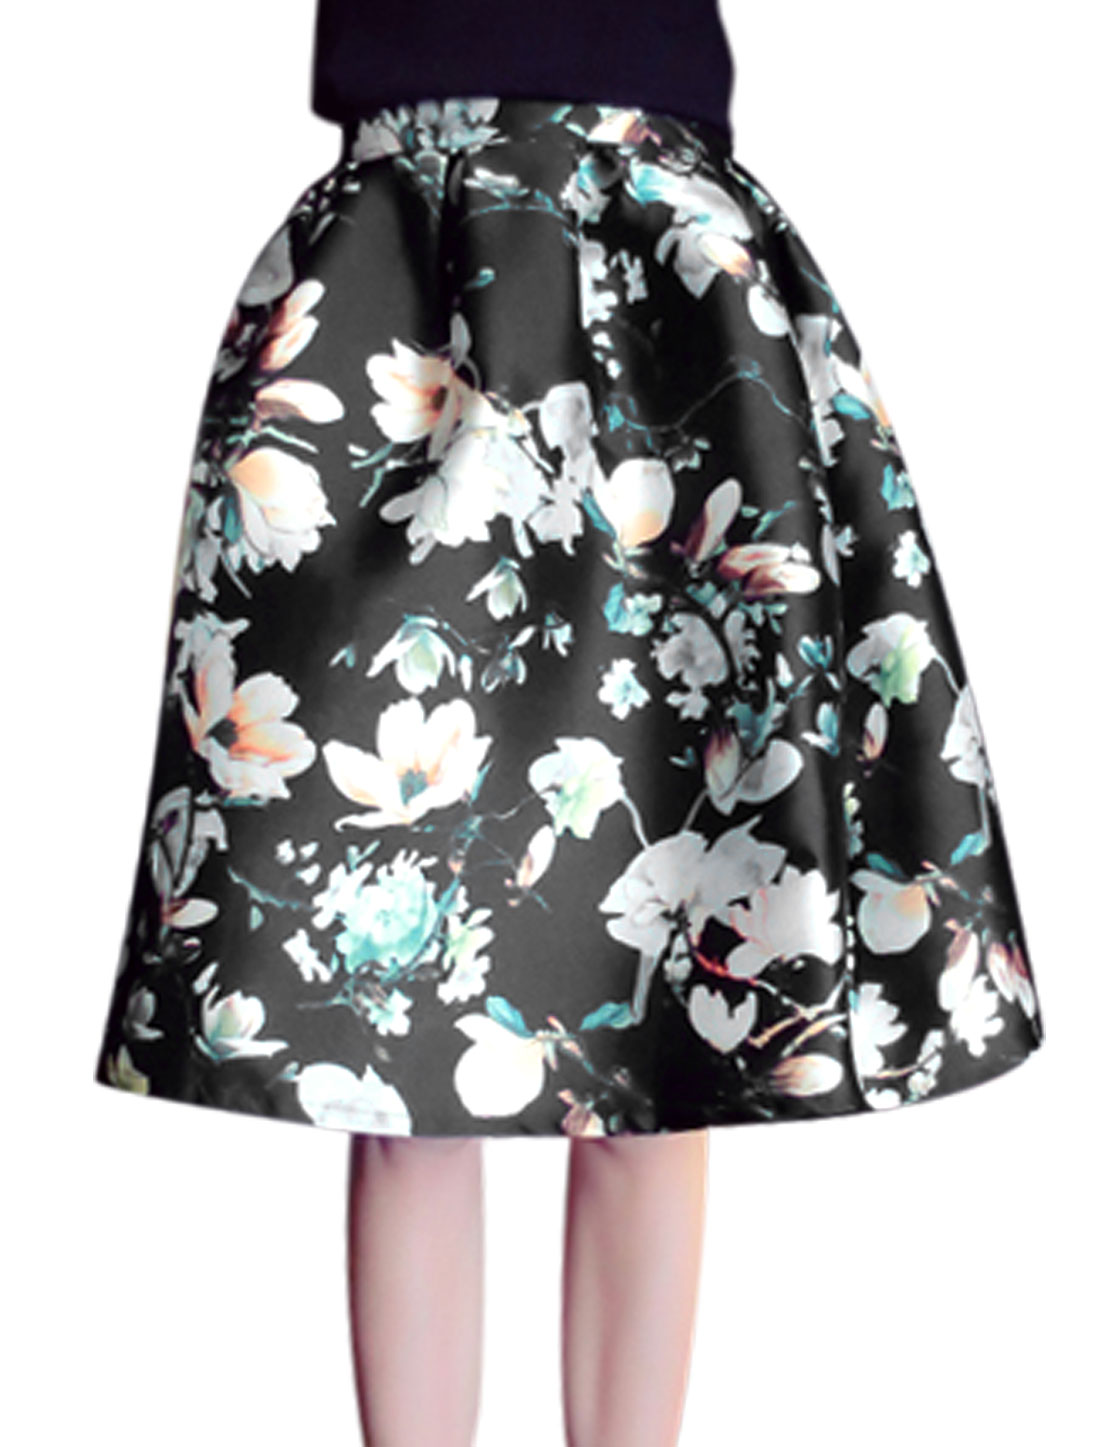 Women Hidden Zipper Side Floral Prints Casual Full Skirt Black S